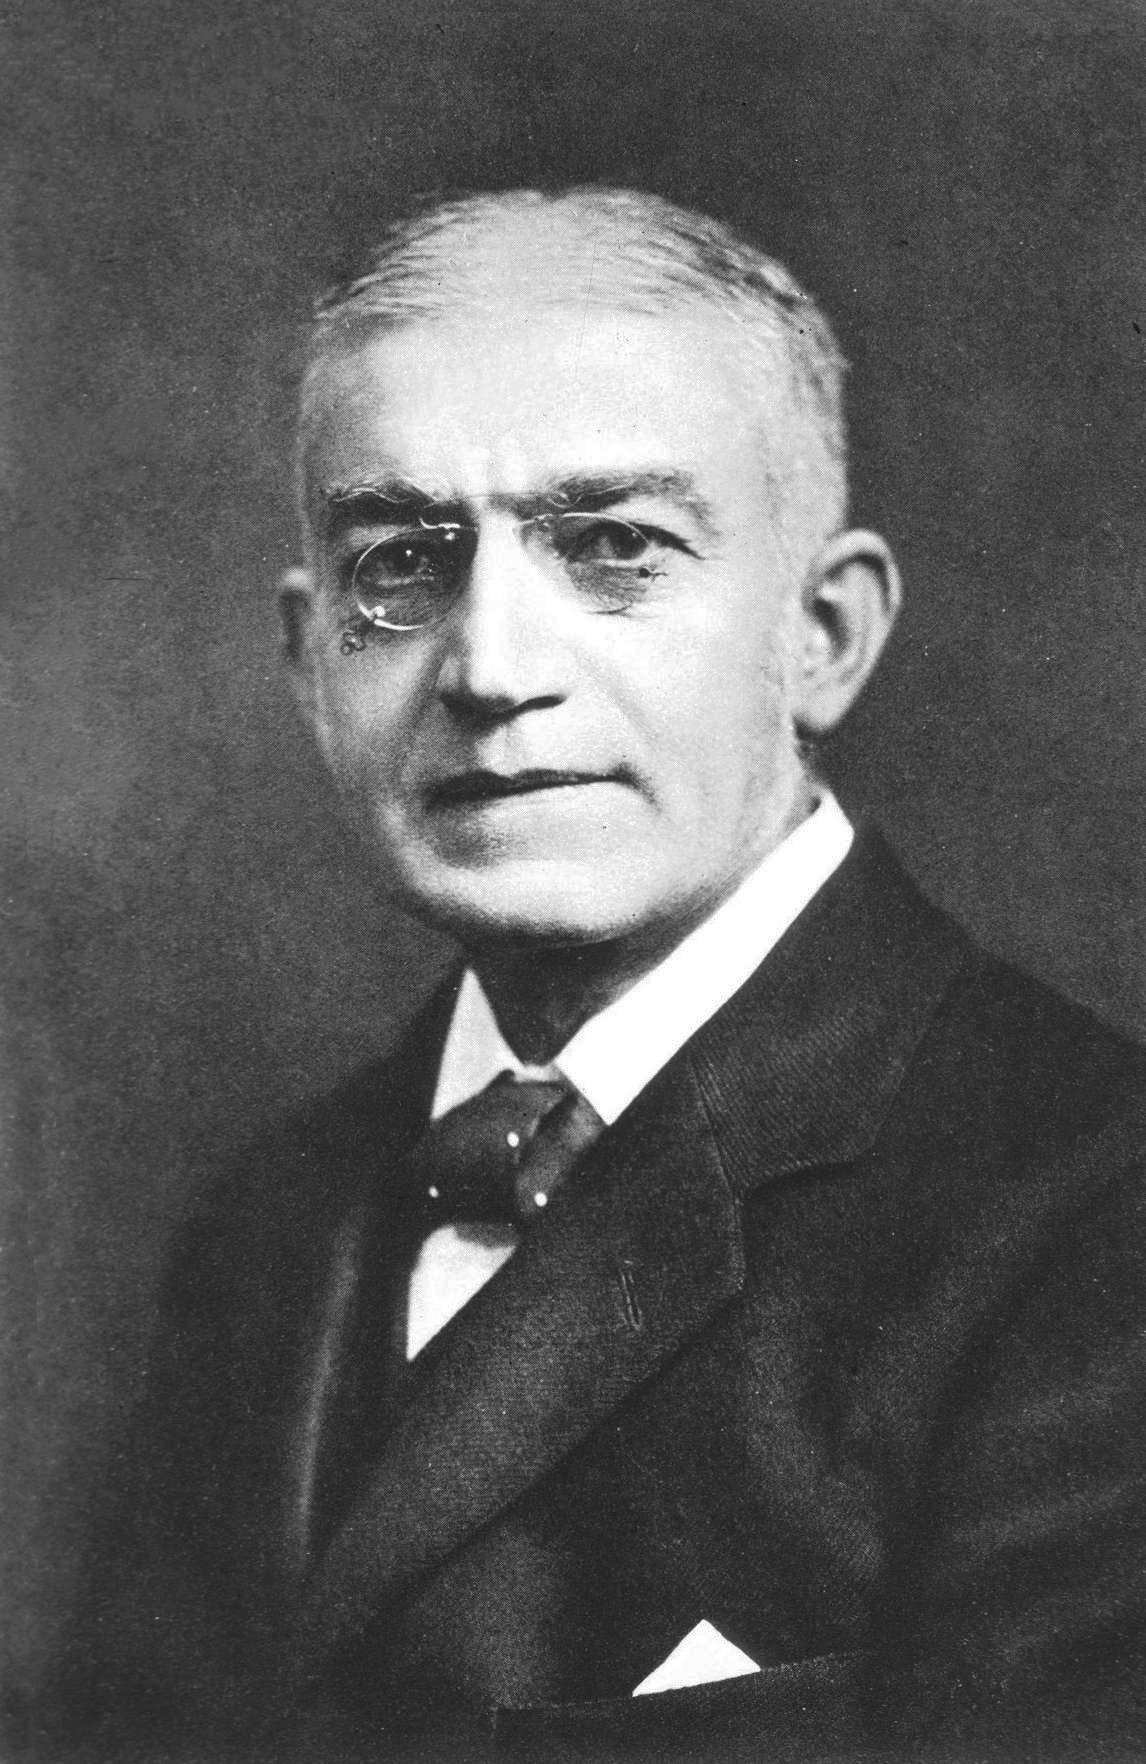 https://upload.wikimedia.org/wikipedia/commons/1/1f/William_Ewart_b1848.jpg